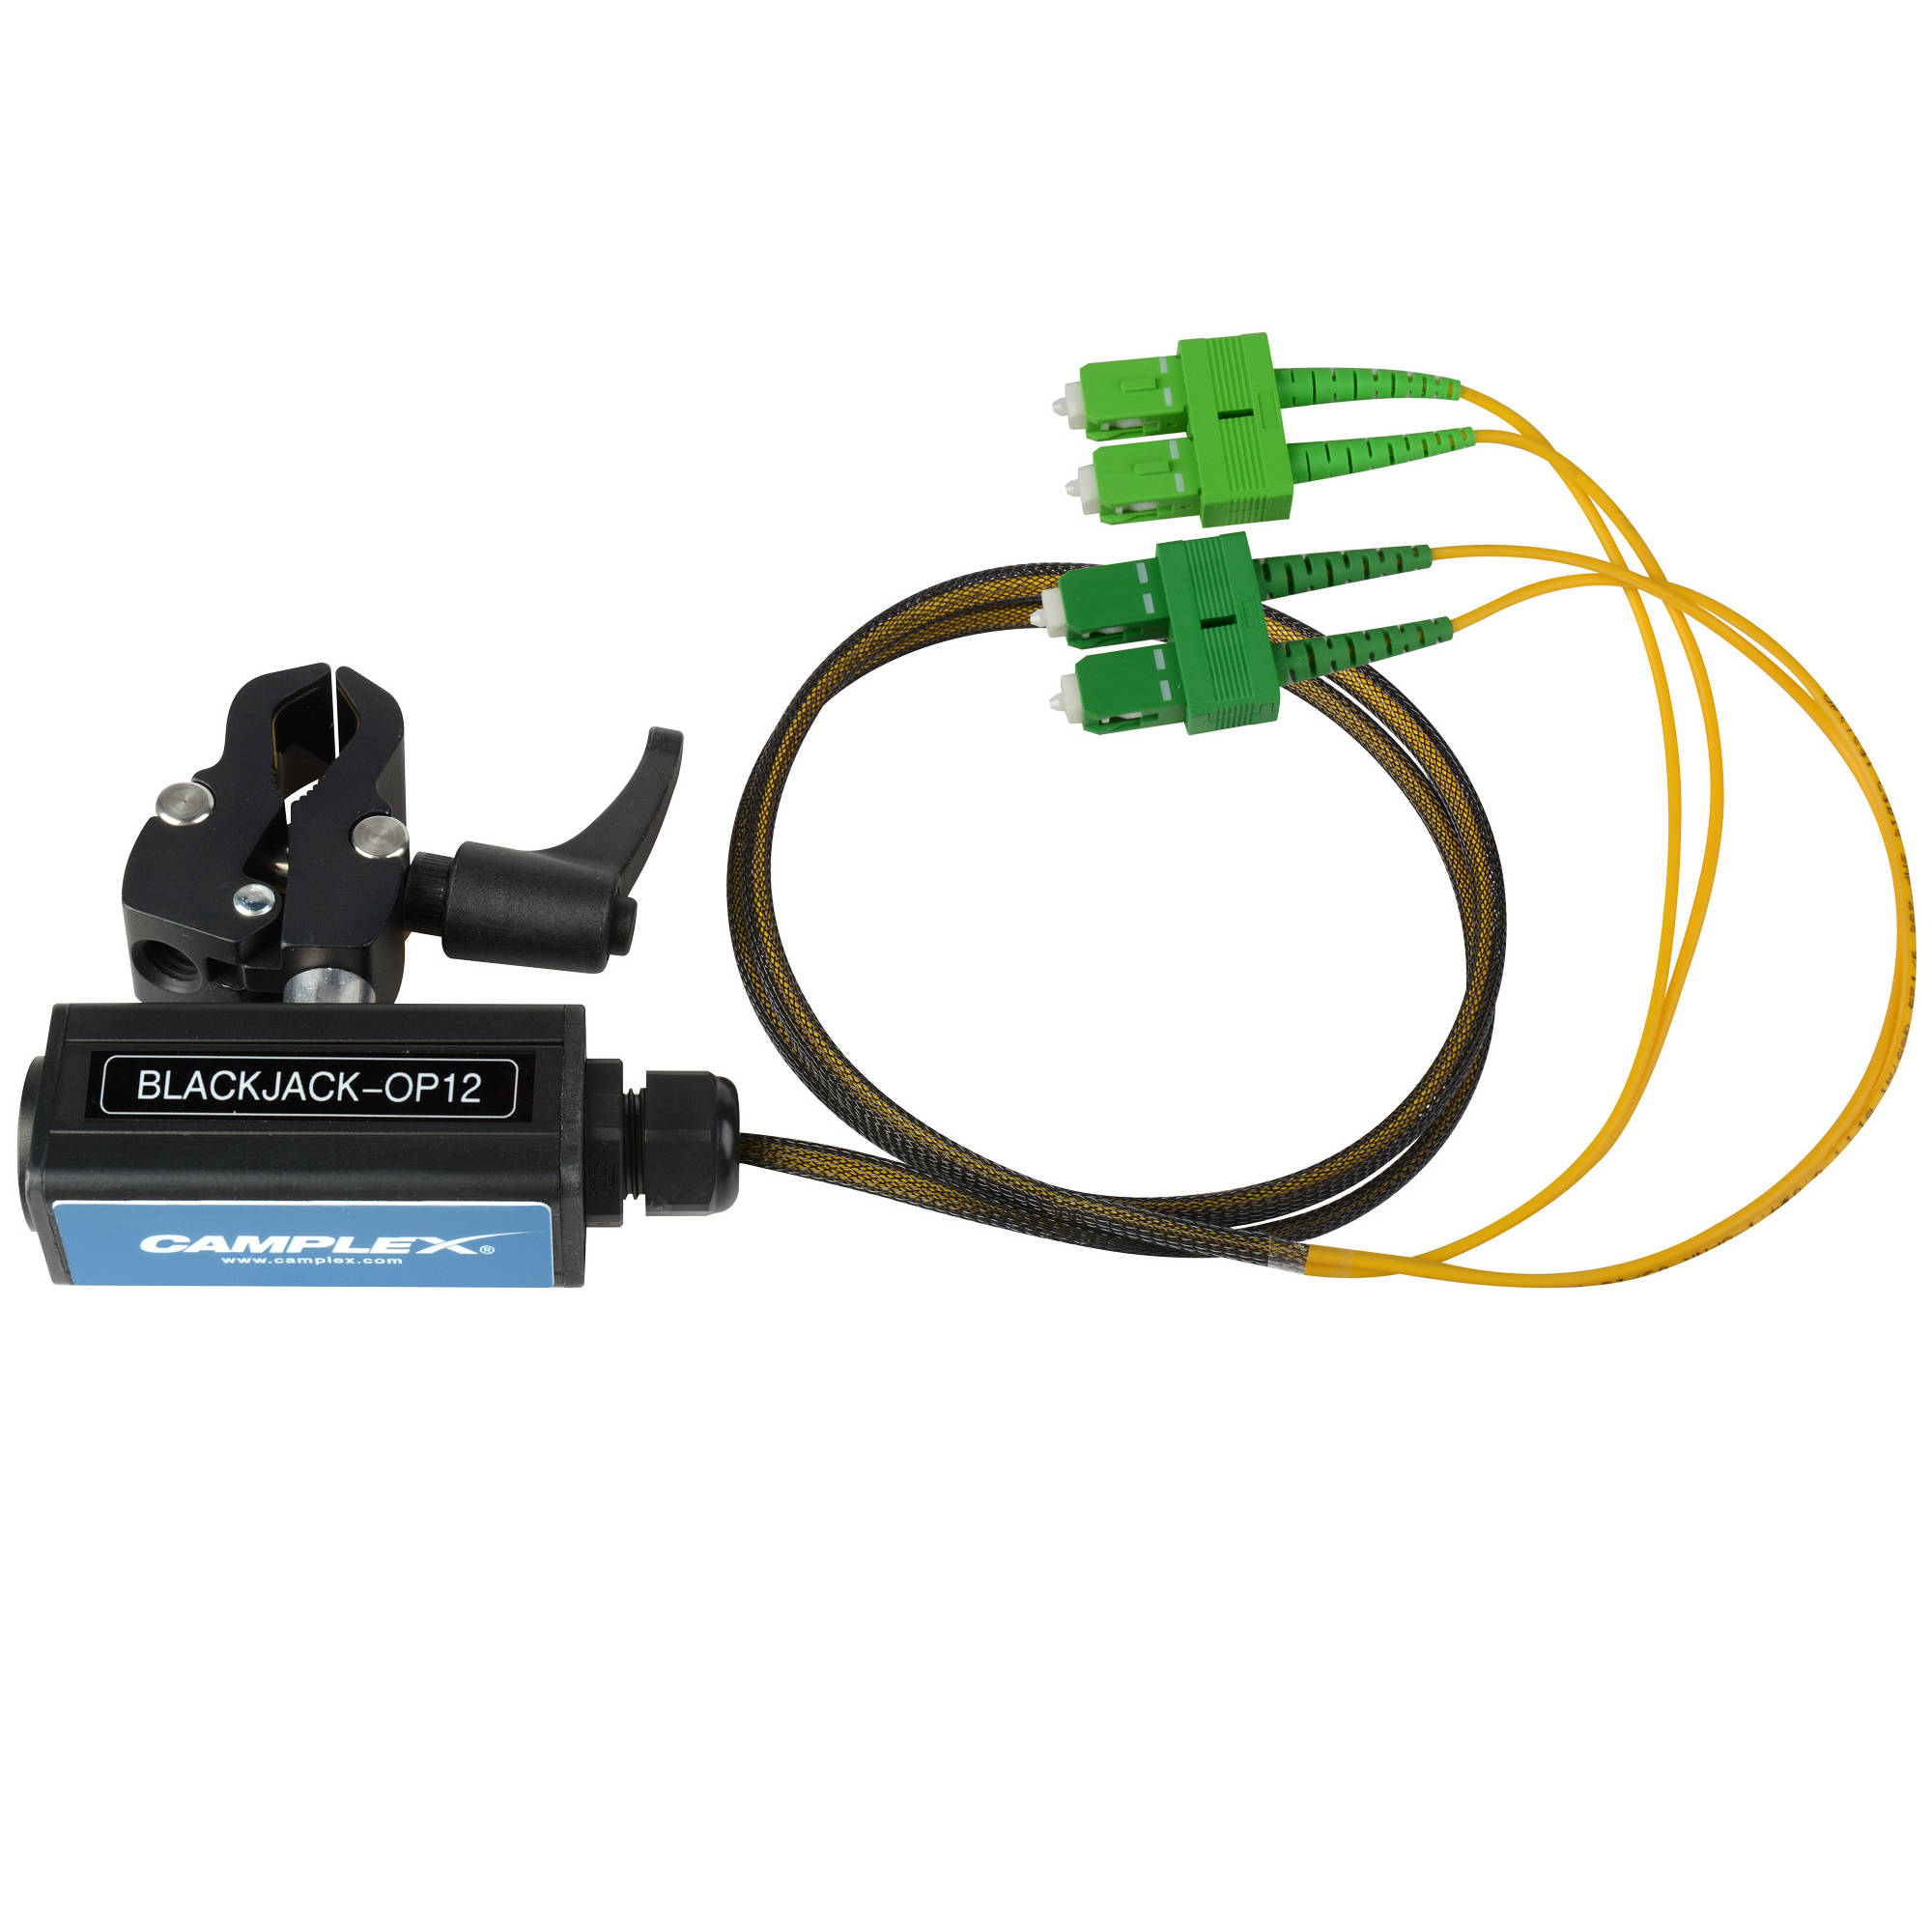 Db9 To Rj45 Connector Wiring Diagram Also Altec Lansing Speaker Wiring